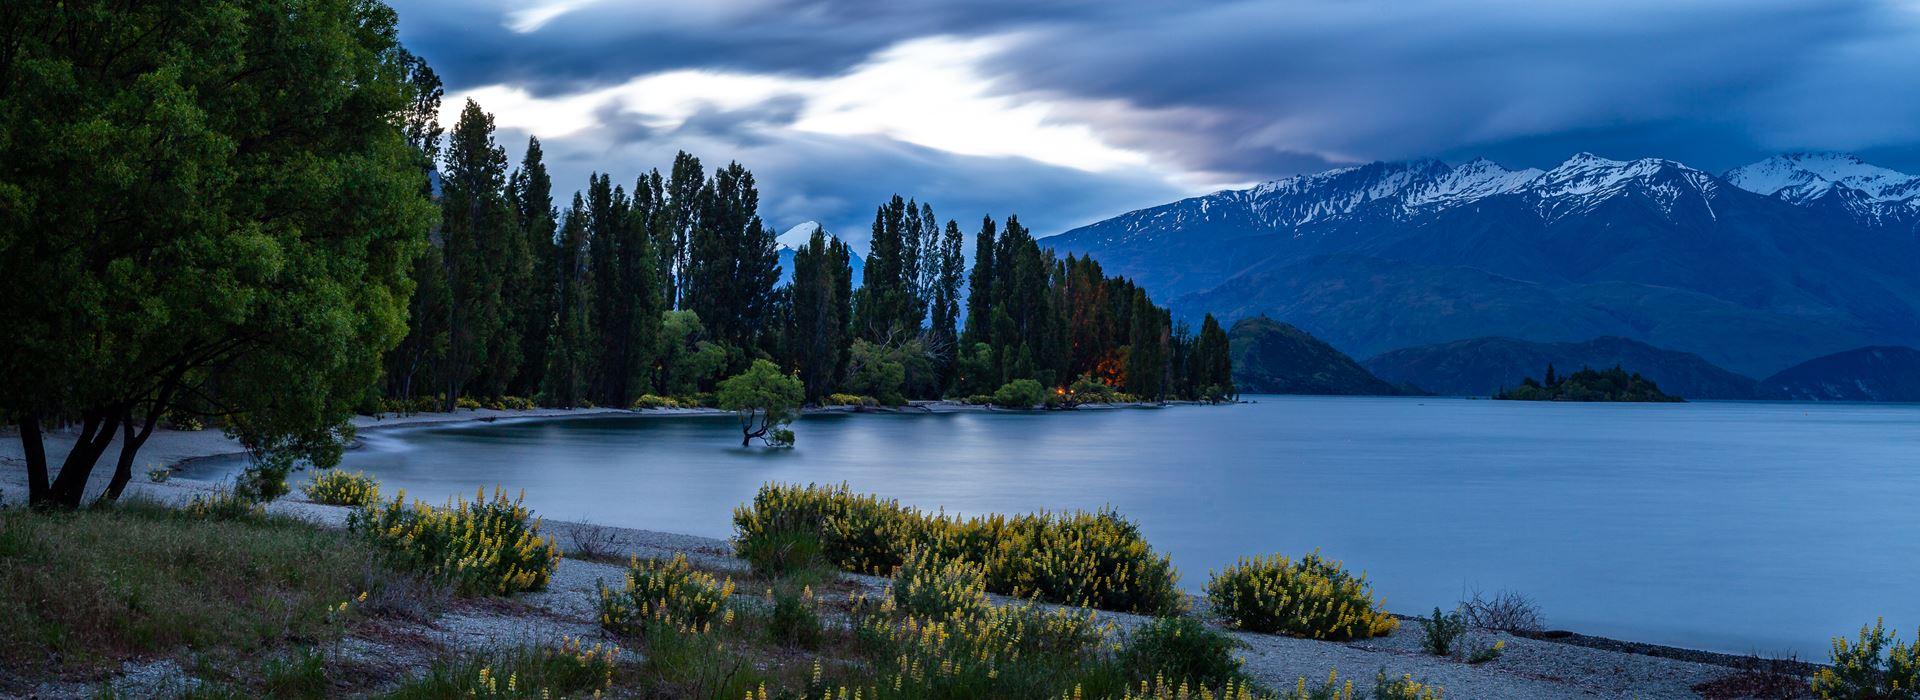 Tổng quan về New Zealand - Du học